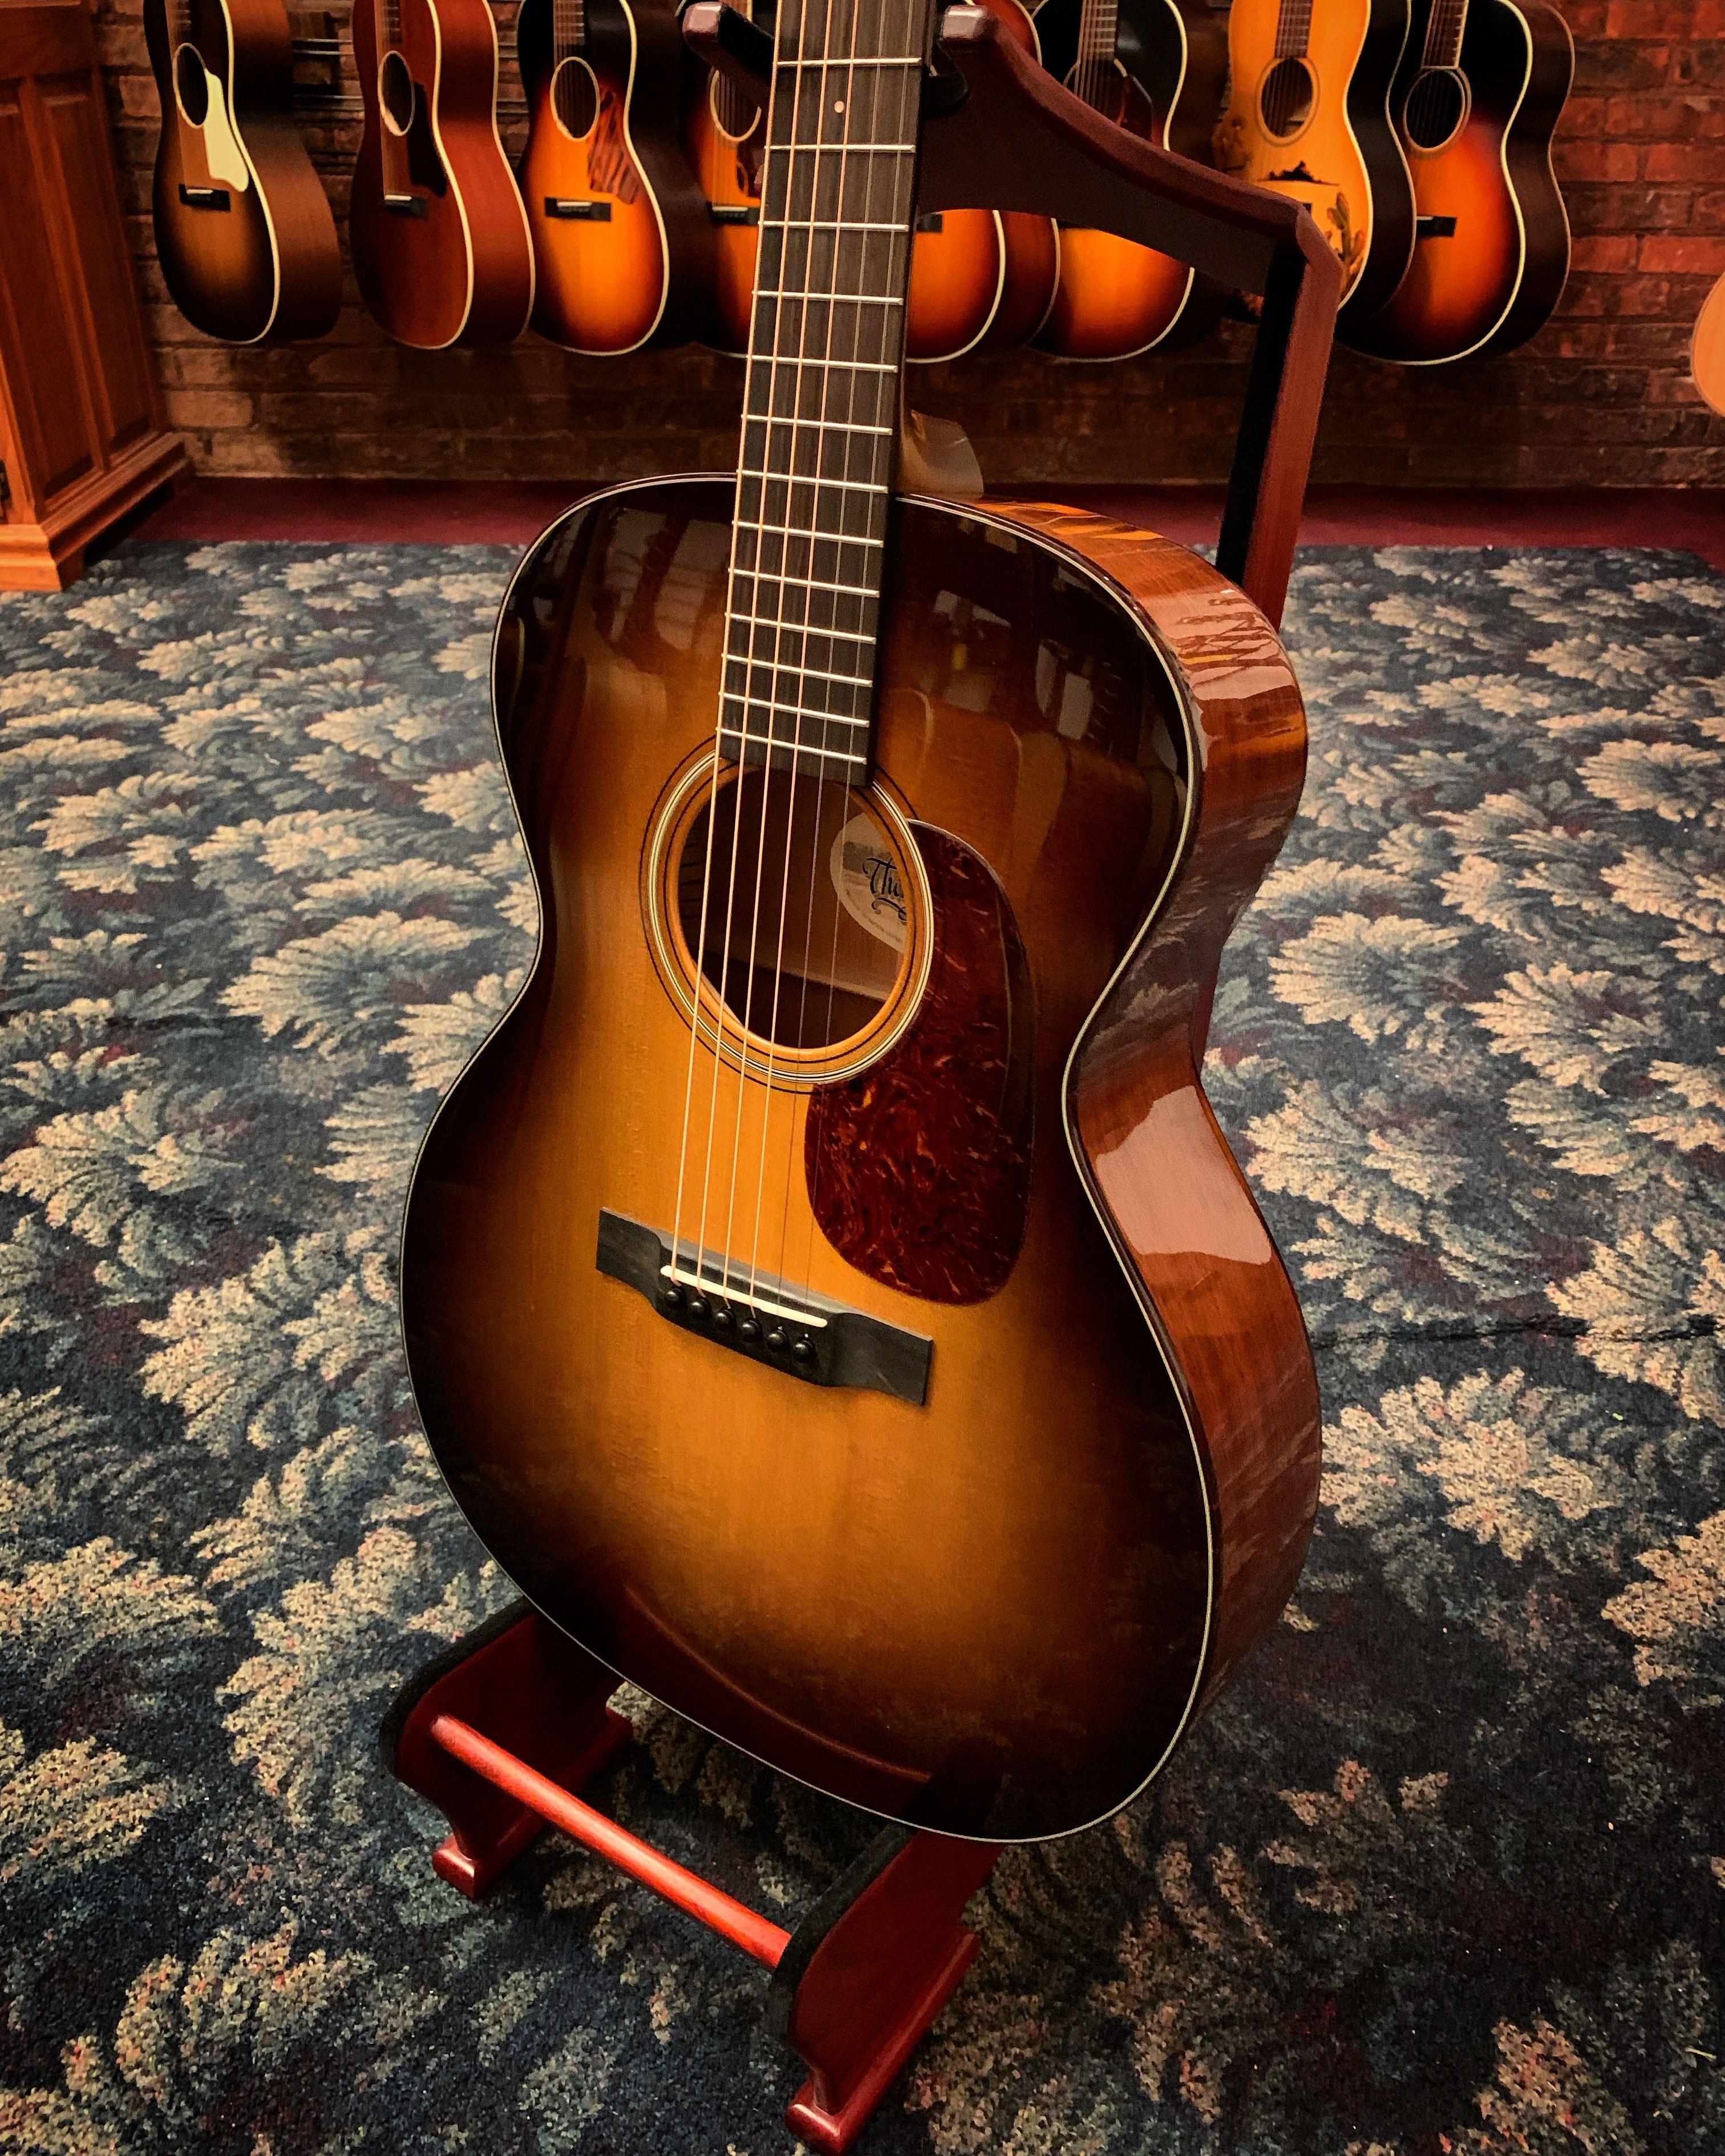 Preston Thompson Guitars 000 14ms Acoustic Guitar With Case Guitar Acoustic Guitar Acoustic Guitar Tuner